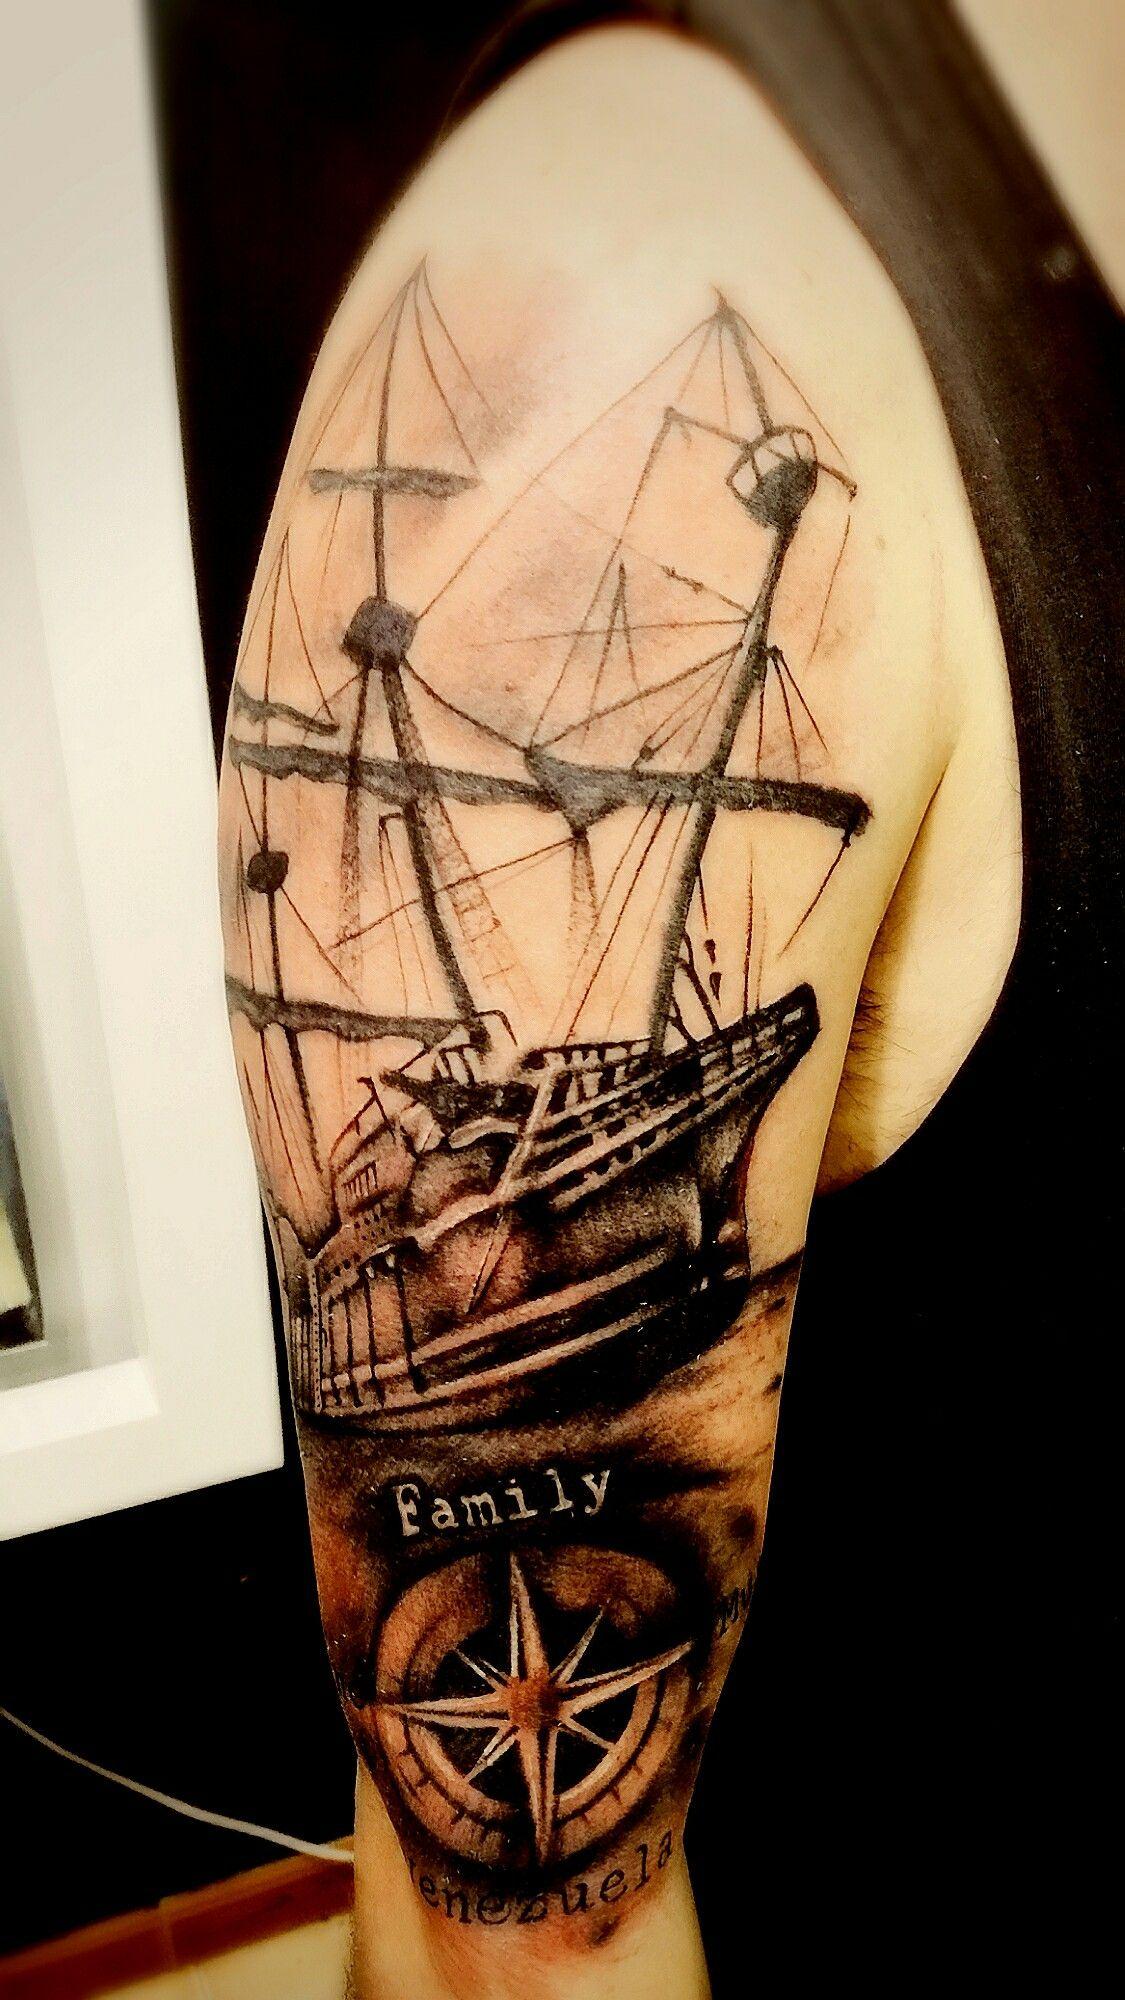 Mi segundo tatuaje ship tattoo que buena pela de aguja tatuajes